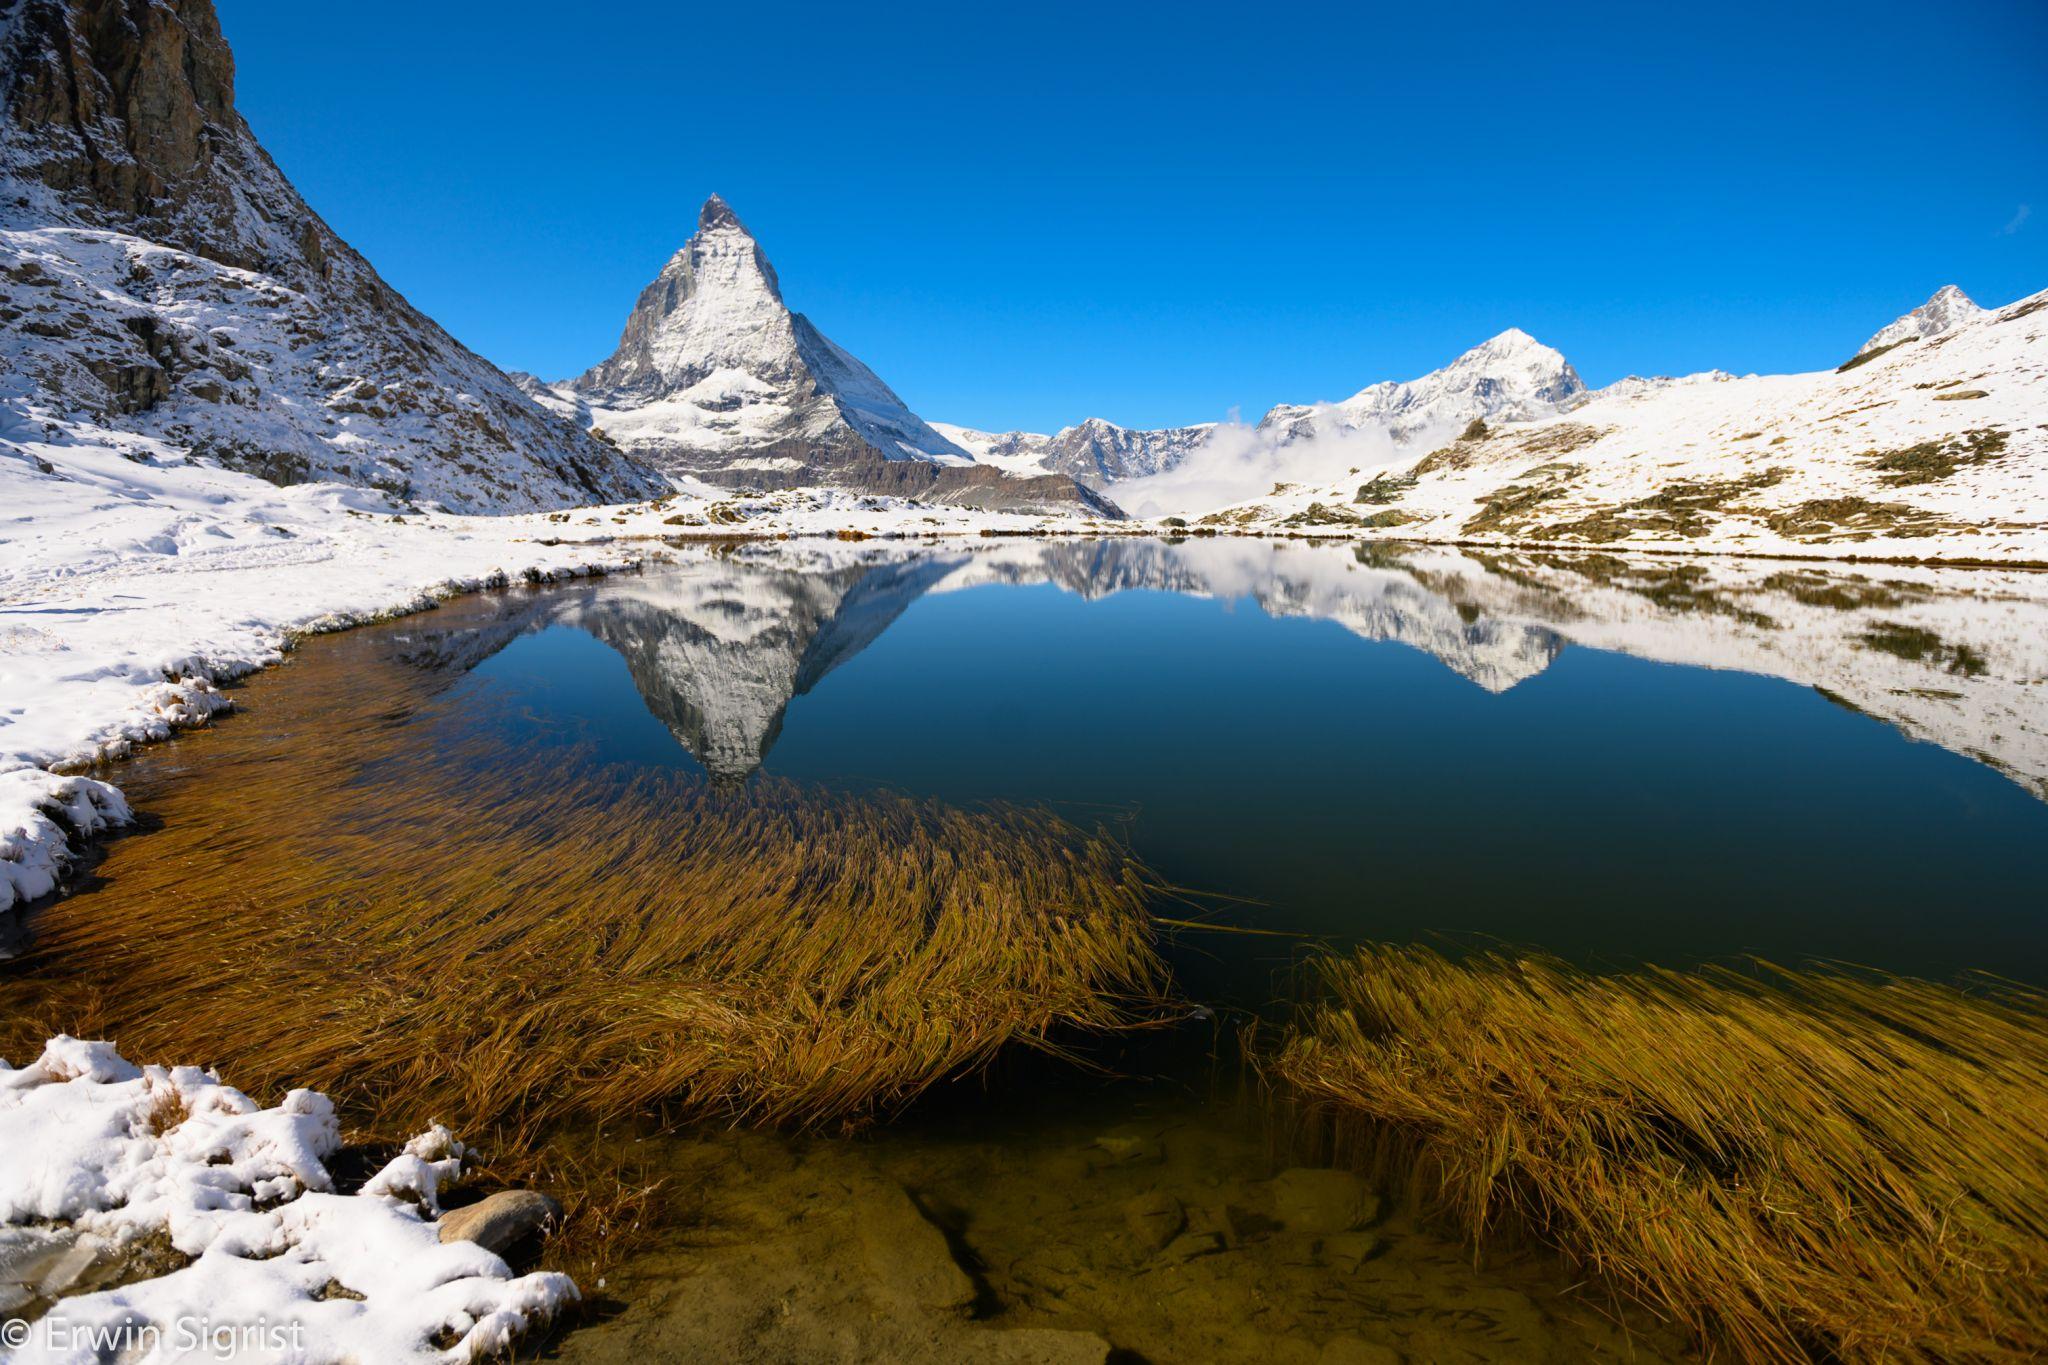 Riffle-Lake near Gornergrat, Switzerland